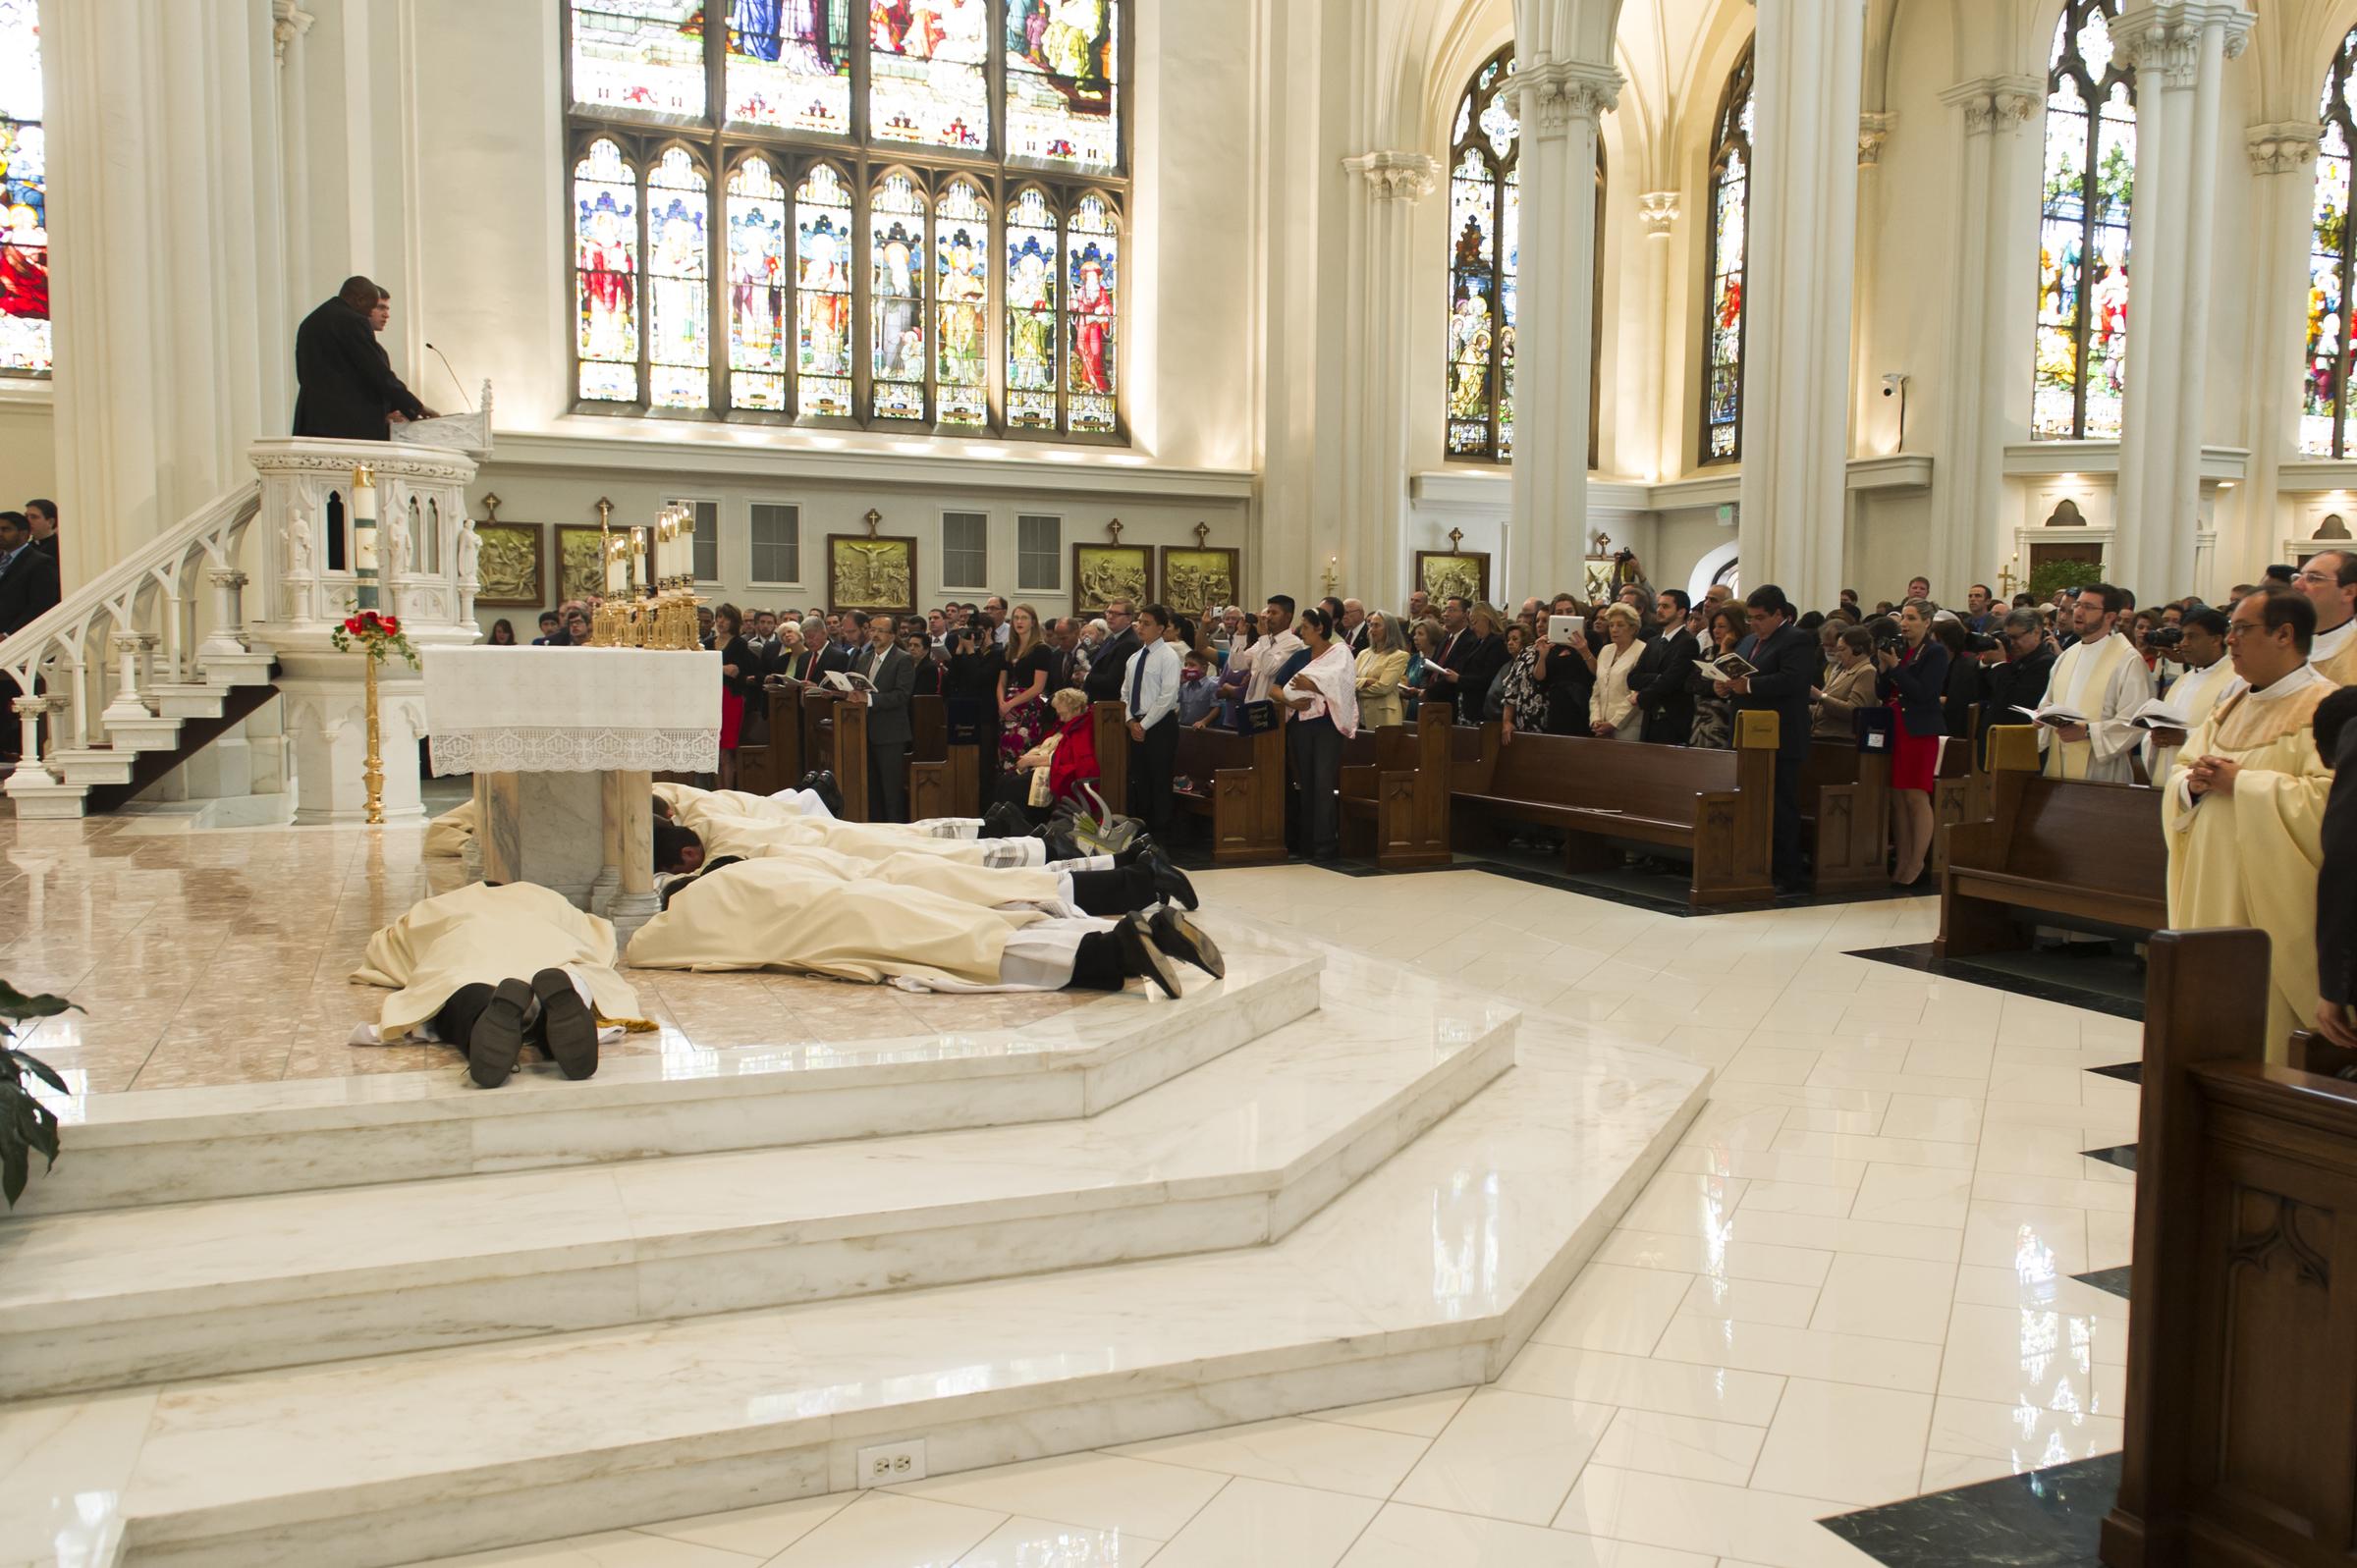 Priest_Ordination_DP25885.jpg